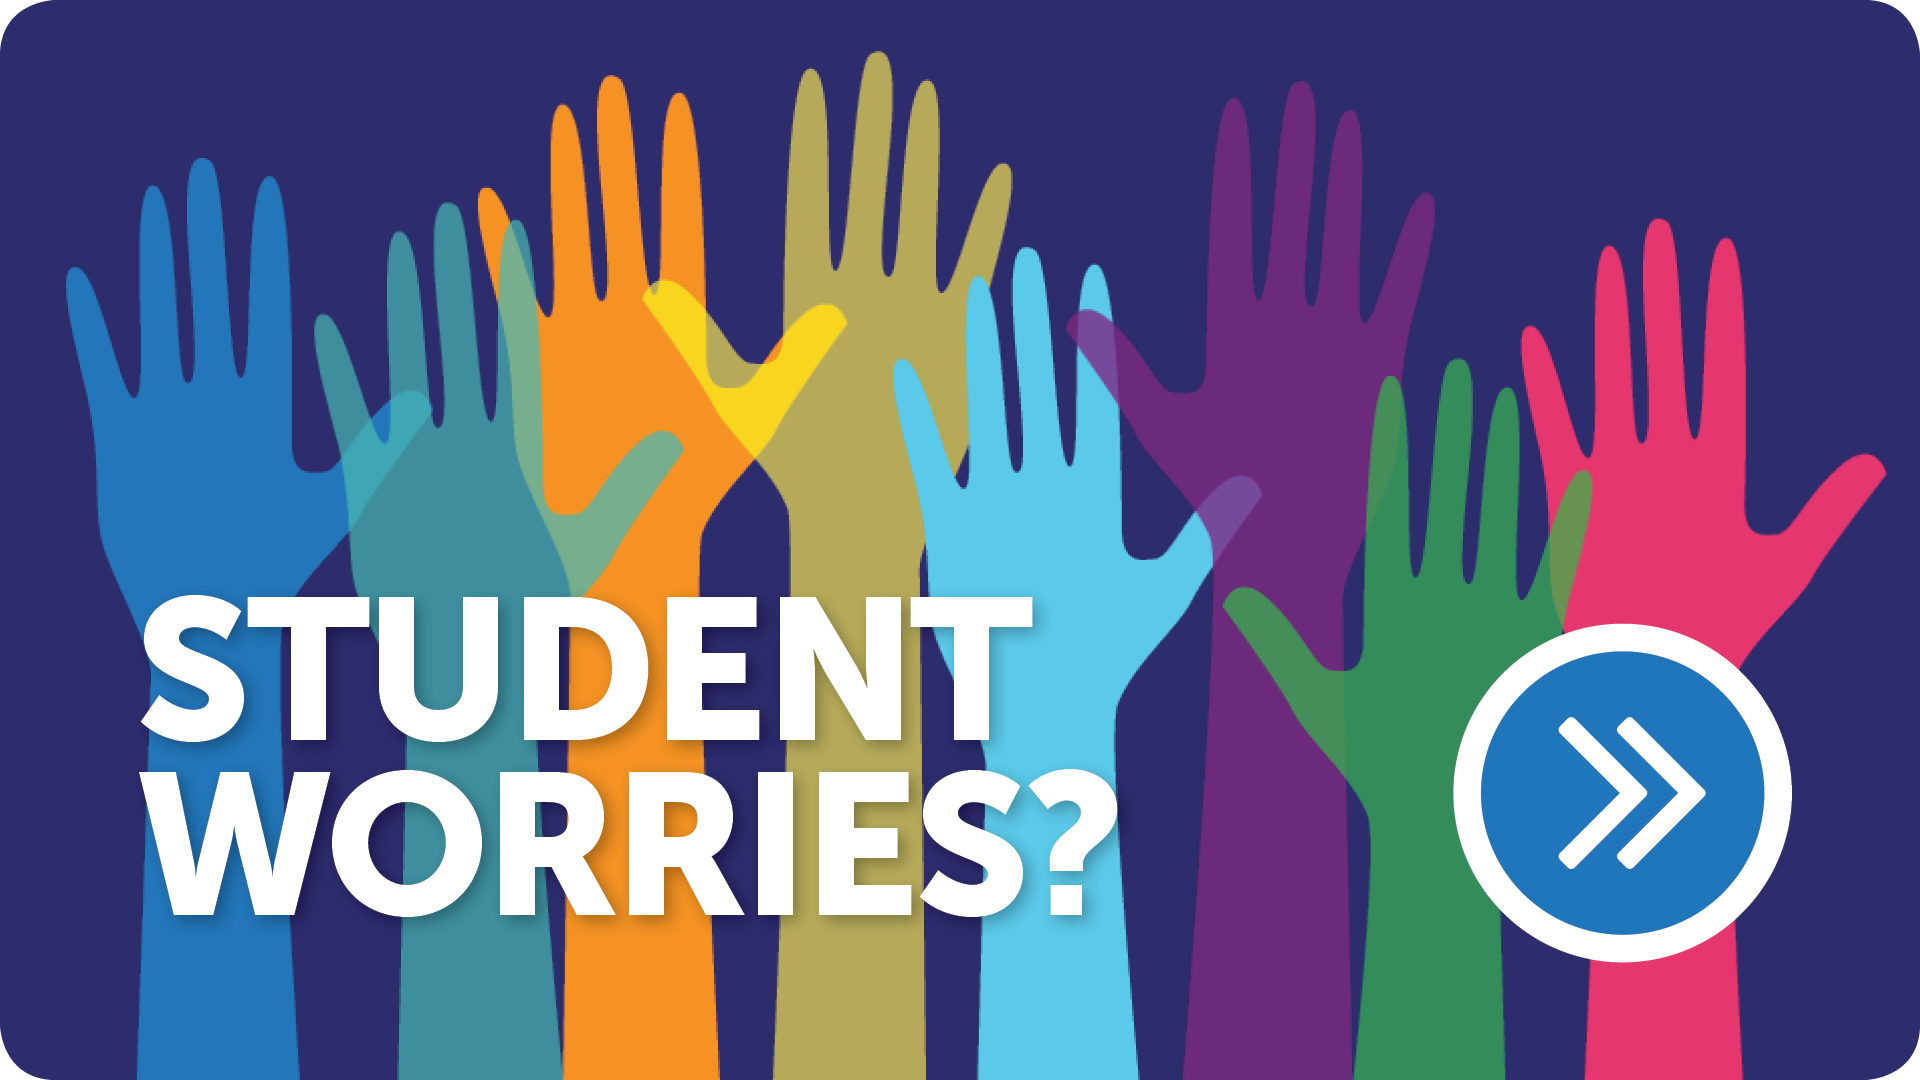 Student Worries?